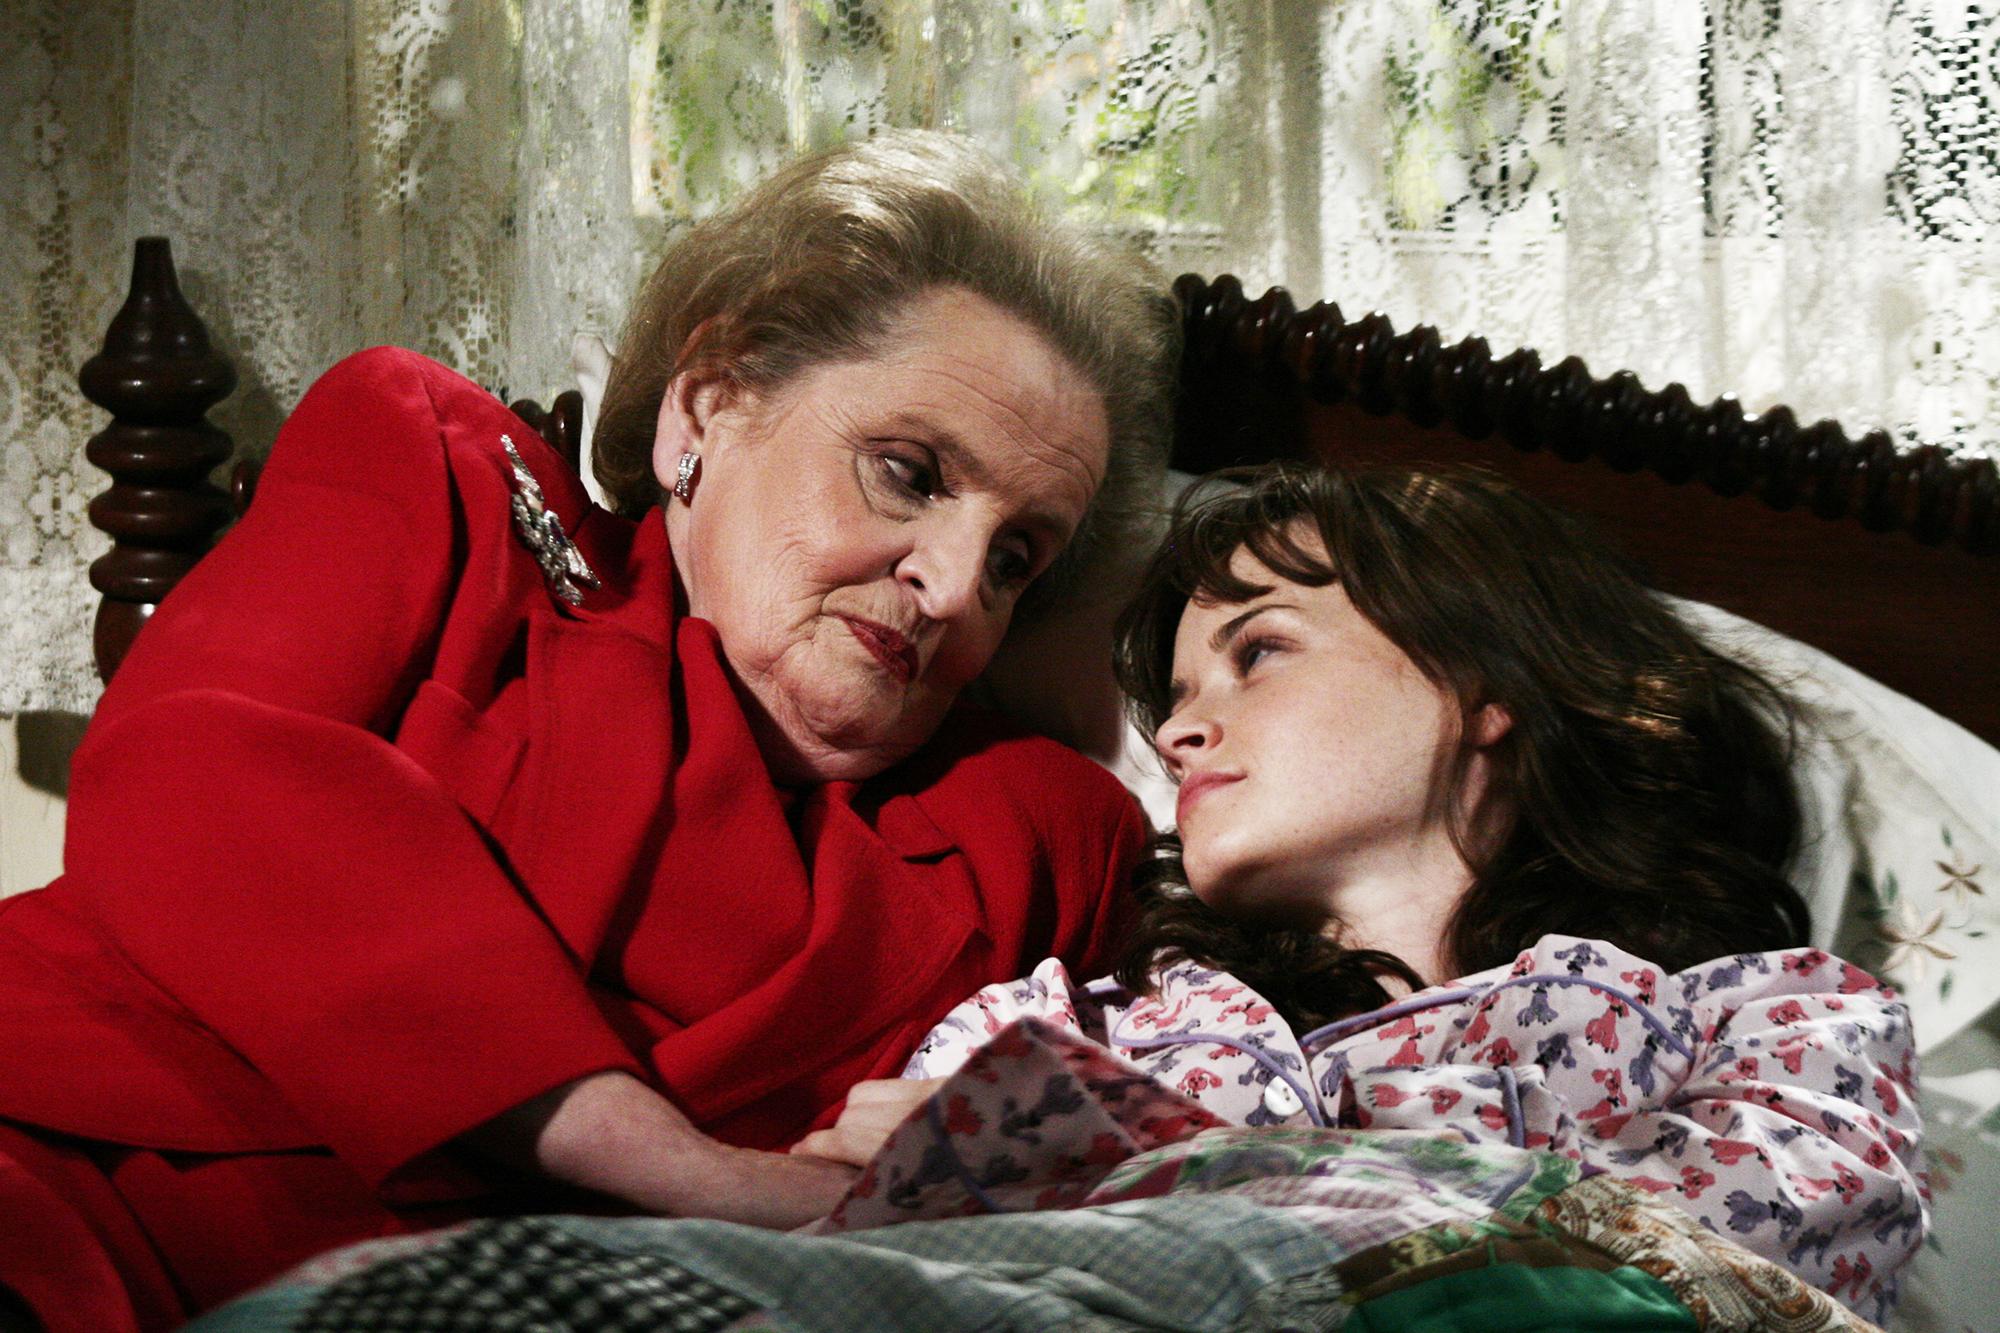 Former Secretary of State Madeleine Albright and Alexis Bledel on Gilmore Girls, 2005.